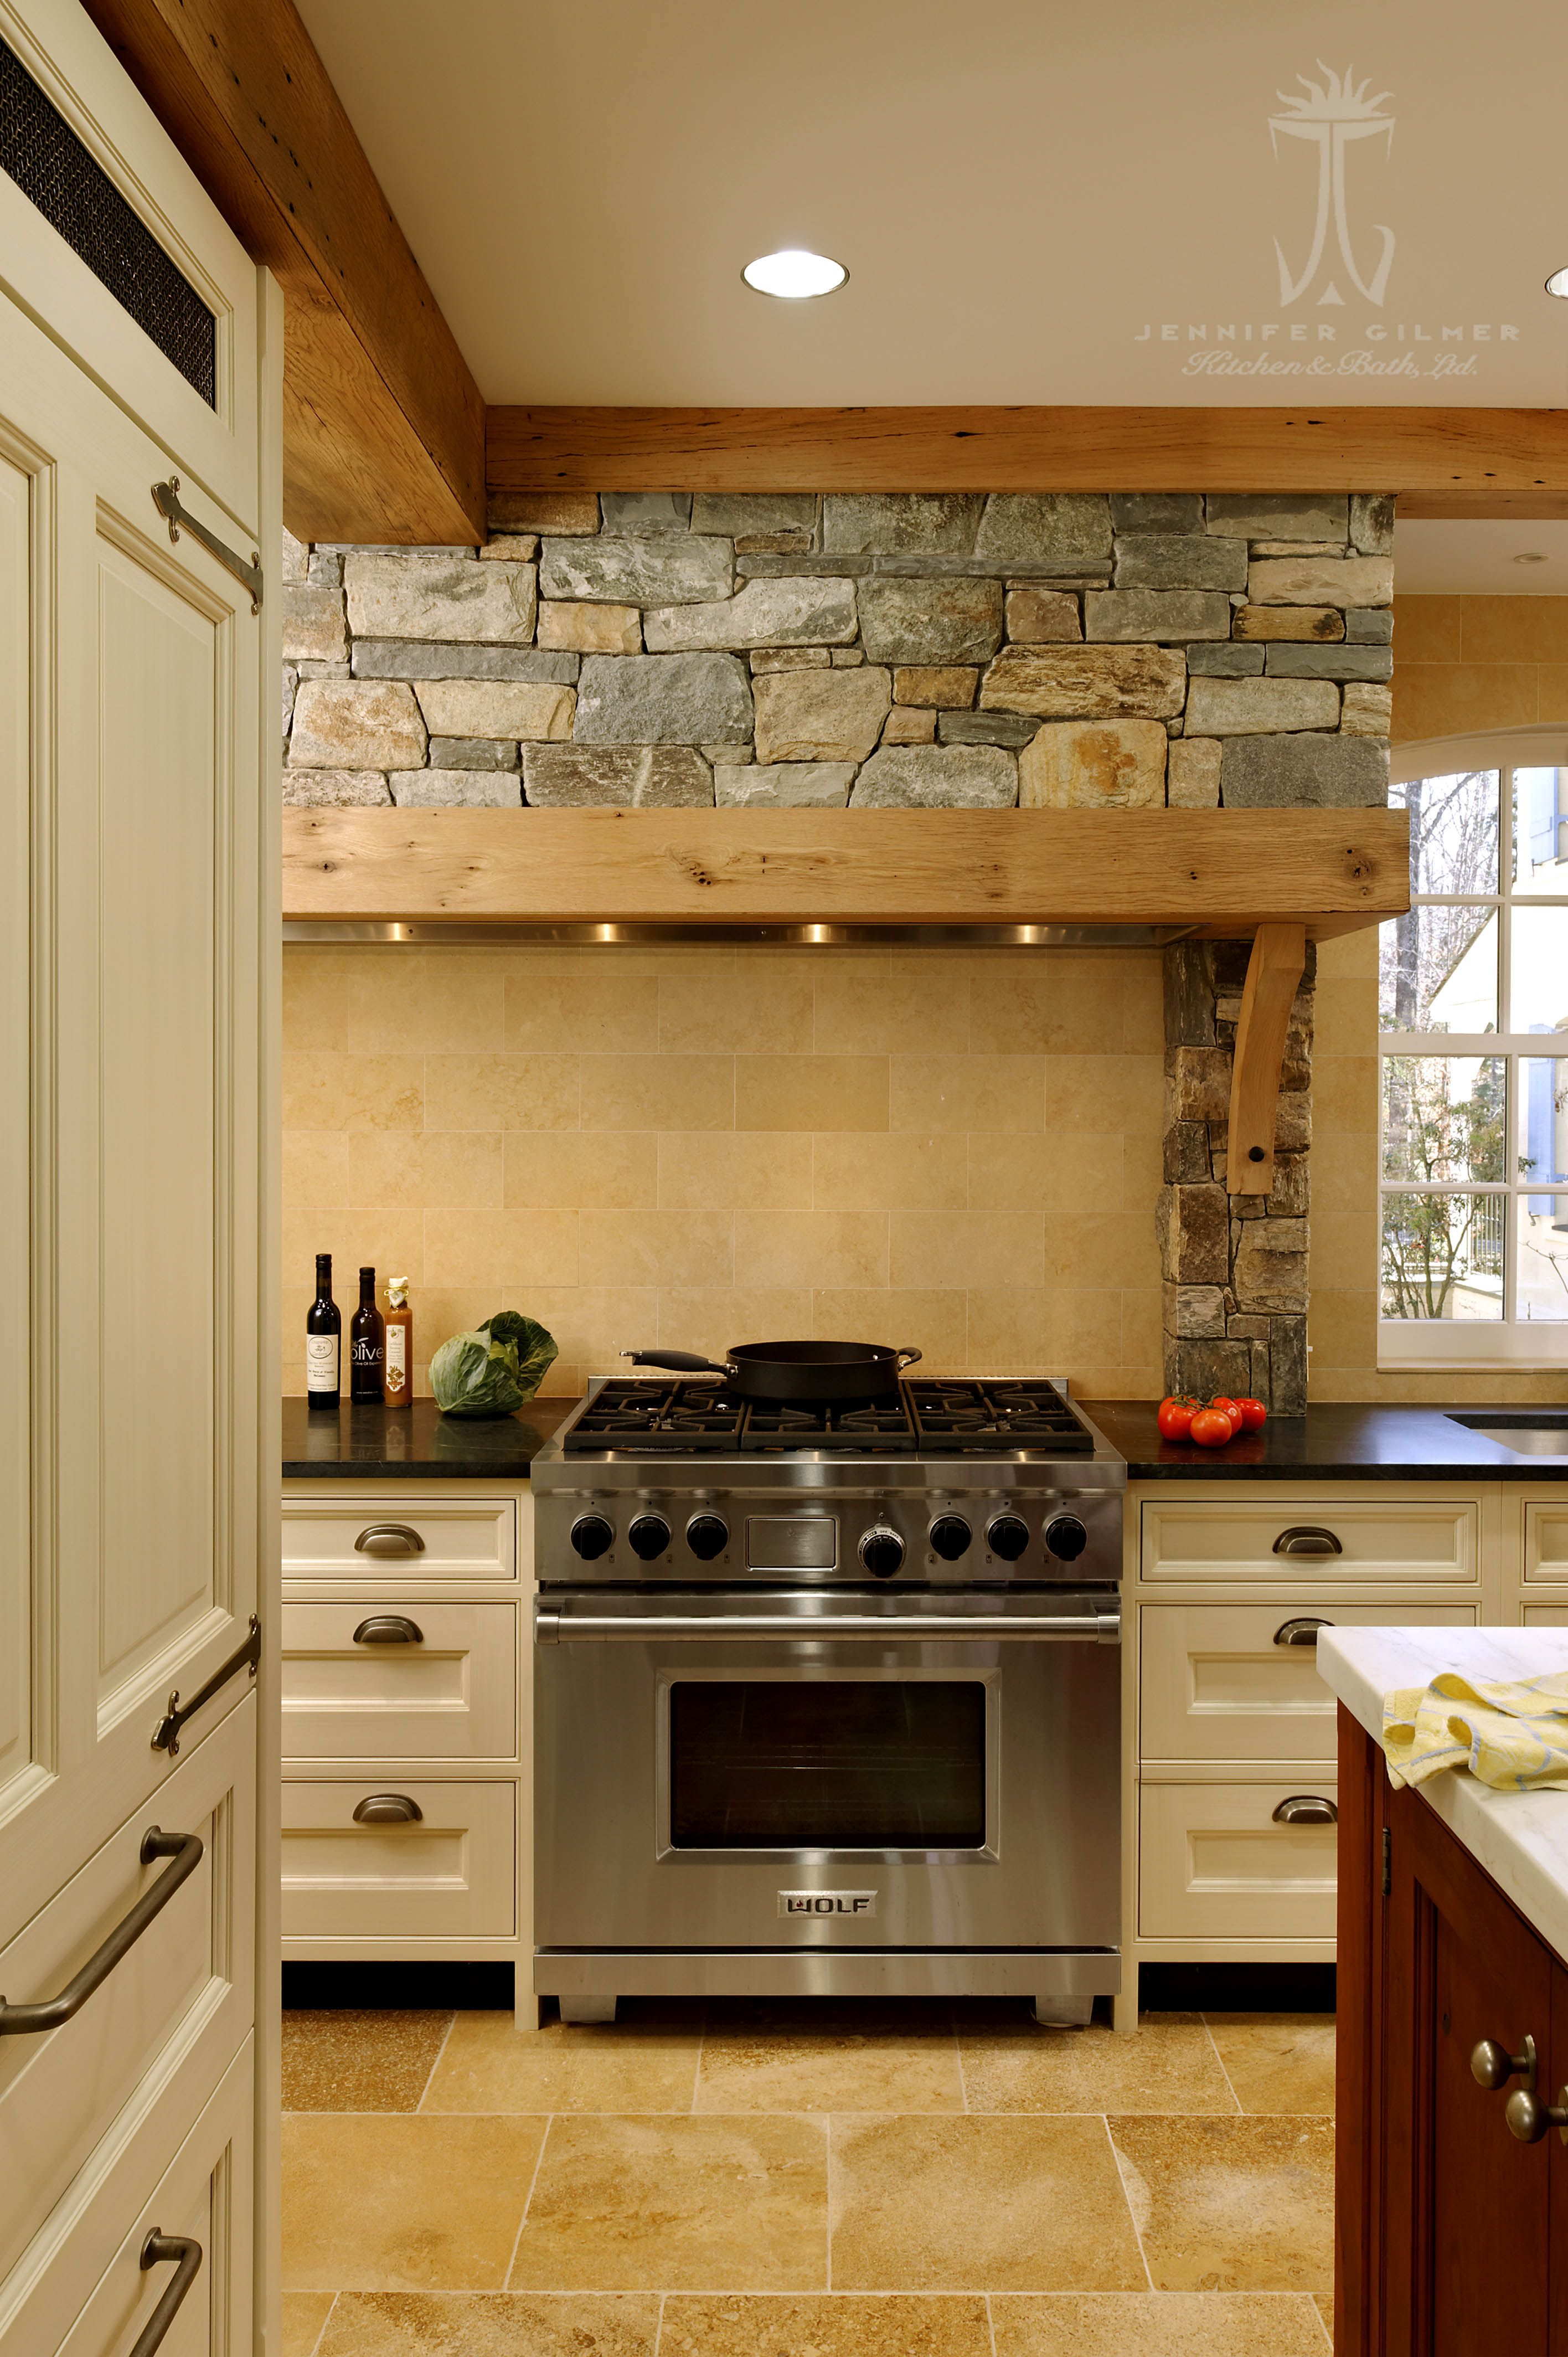 Design by #JenniferGilmer of Jennifer Gilmer Kitchen & Bath in ...